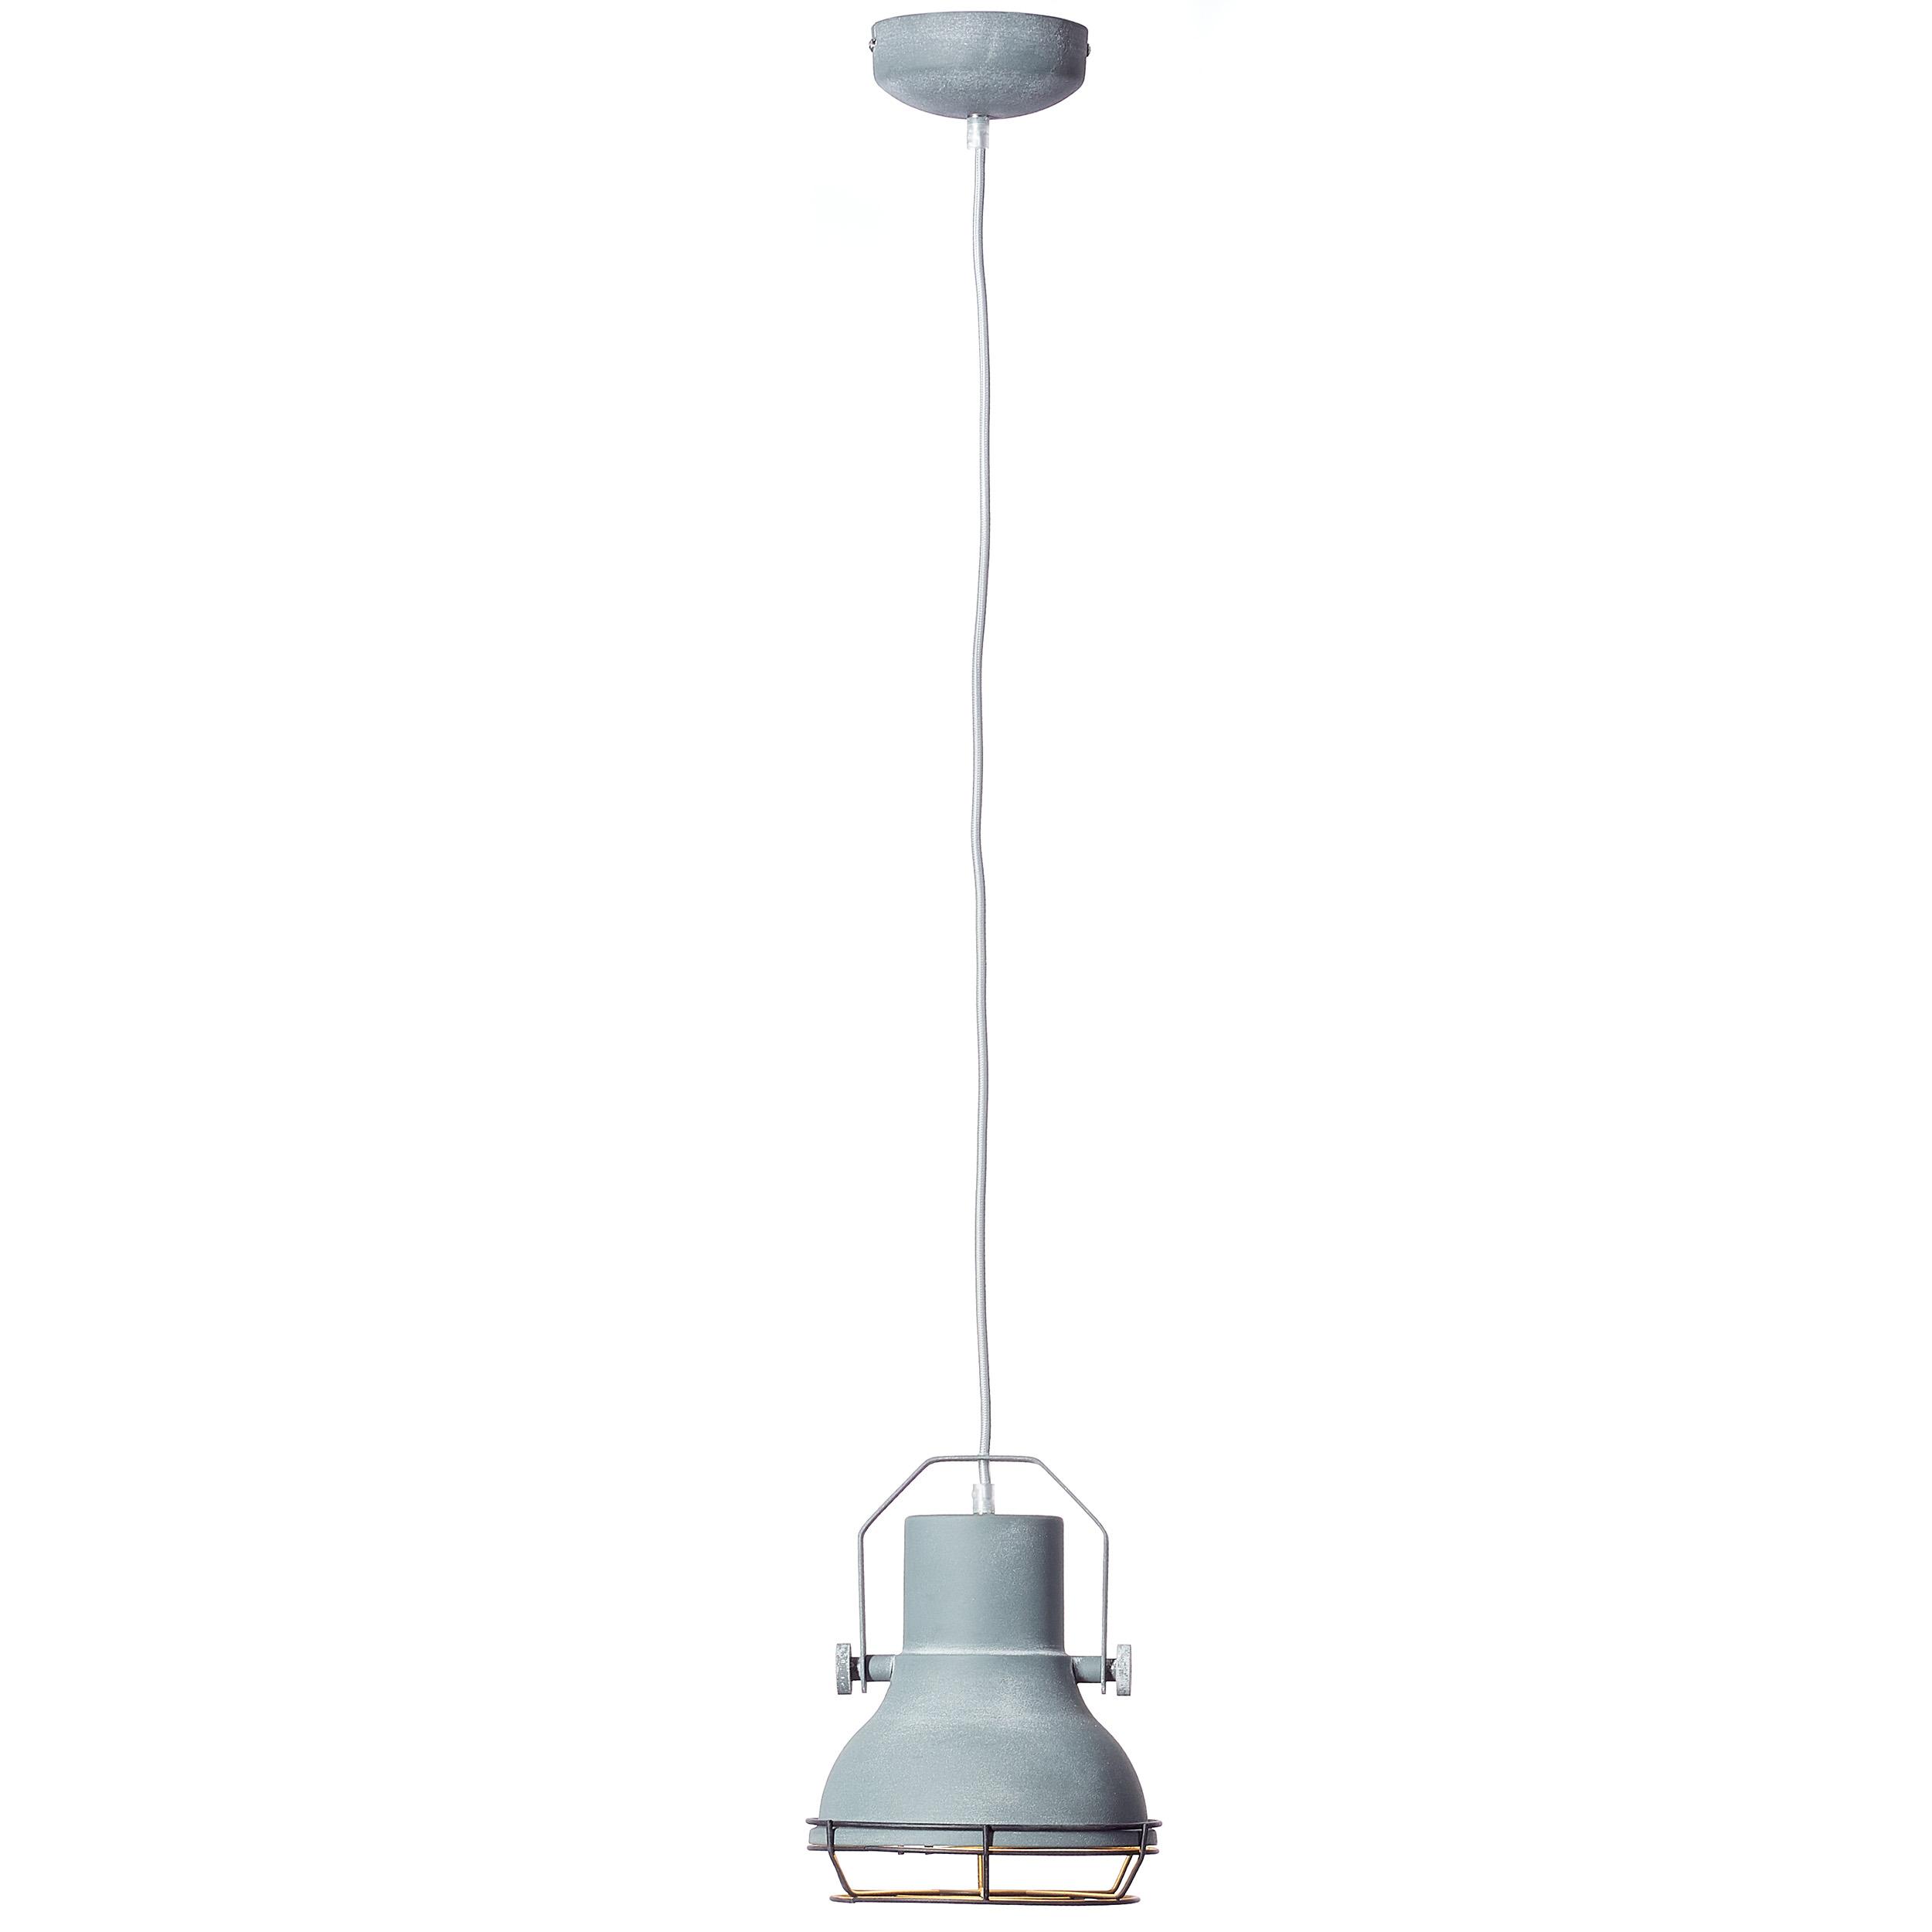 pendelleuchte 1 flammig 1x e27 max 40w metall grau beton lightbox leuchten onlineshop. Black Bedroom Furniture Sets. Home Design Ideas